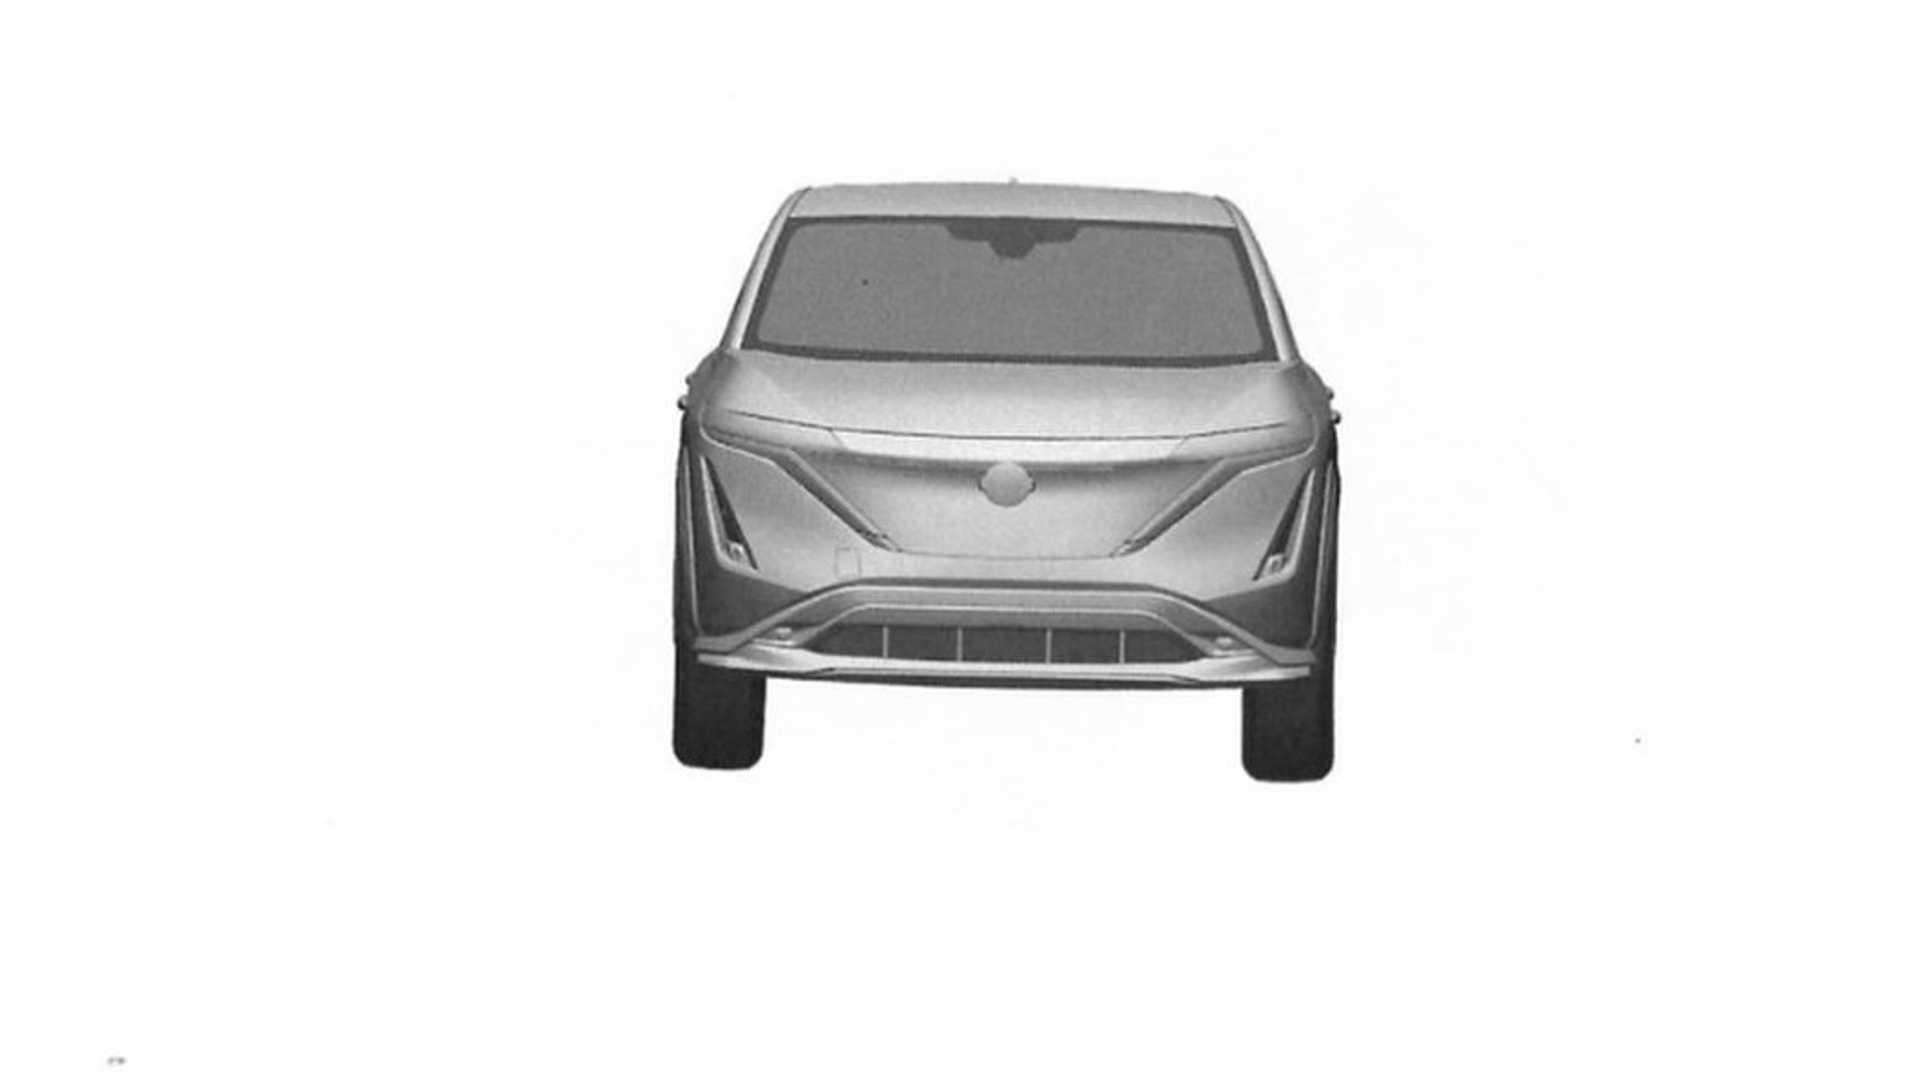 Nissan_Ariya_sketch_patent_0007